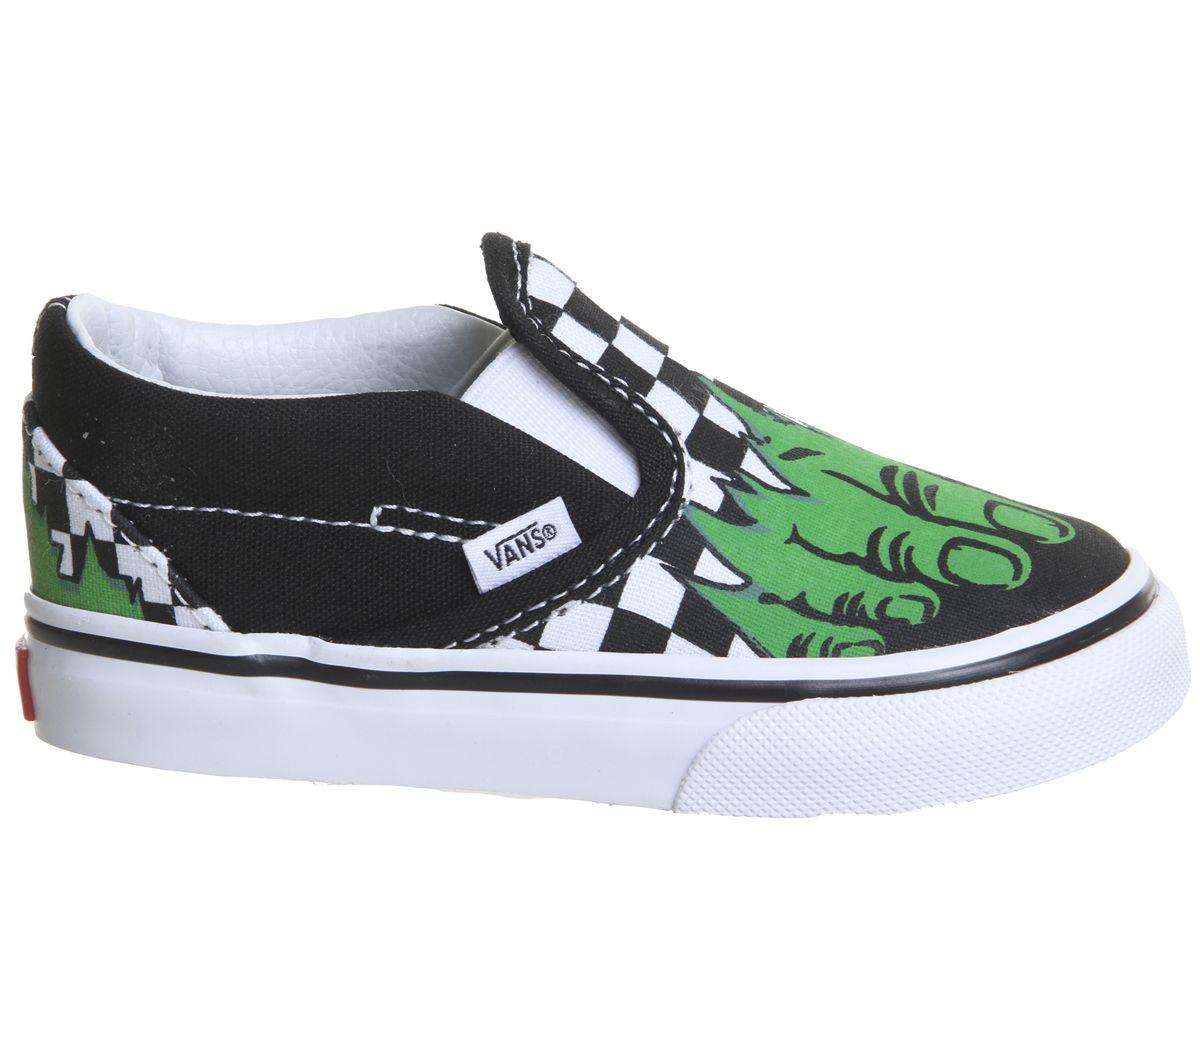 83c5355c7f541f Vans Classic Slip On Toddlers Hulk Checkerboard Marvel - Unisex